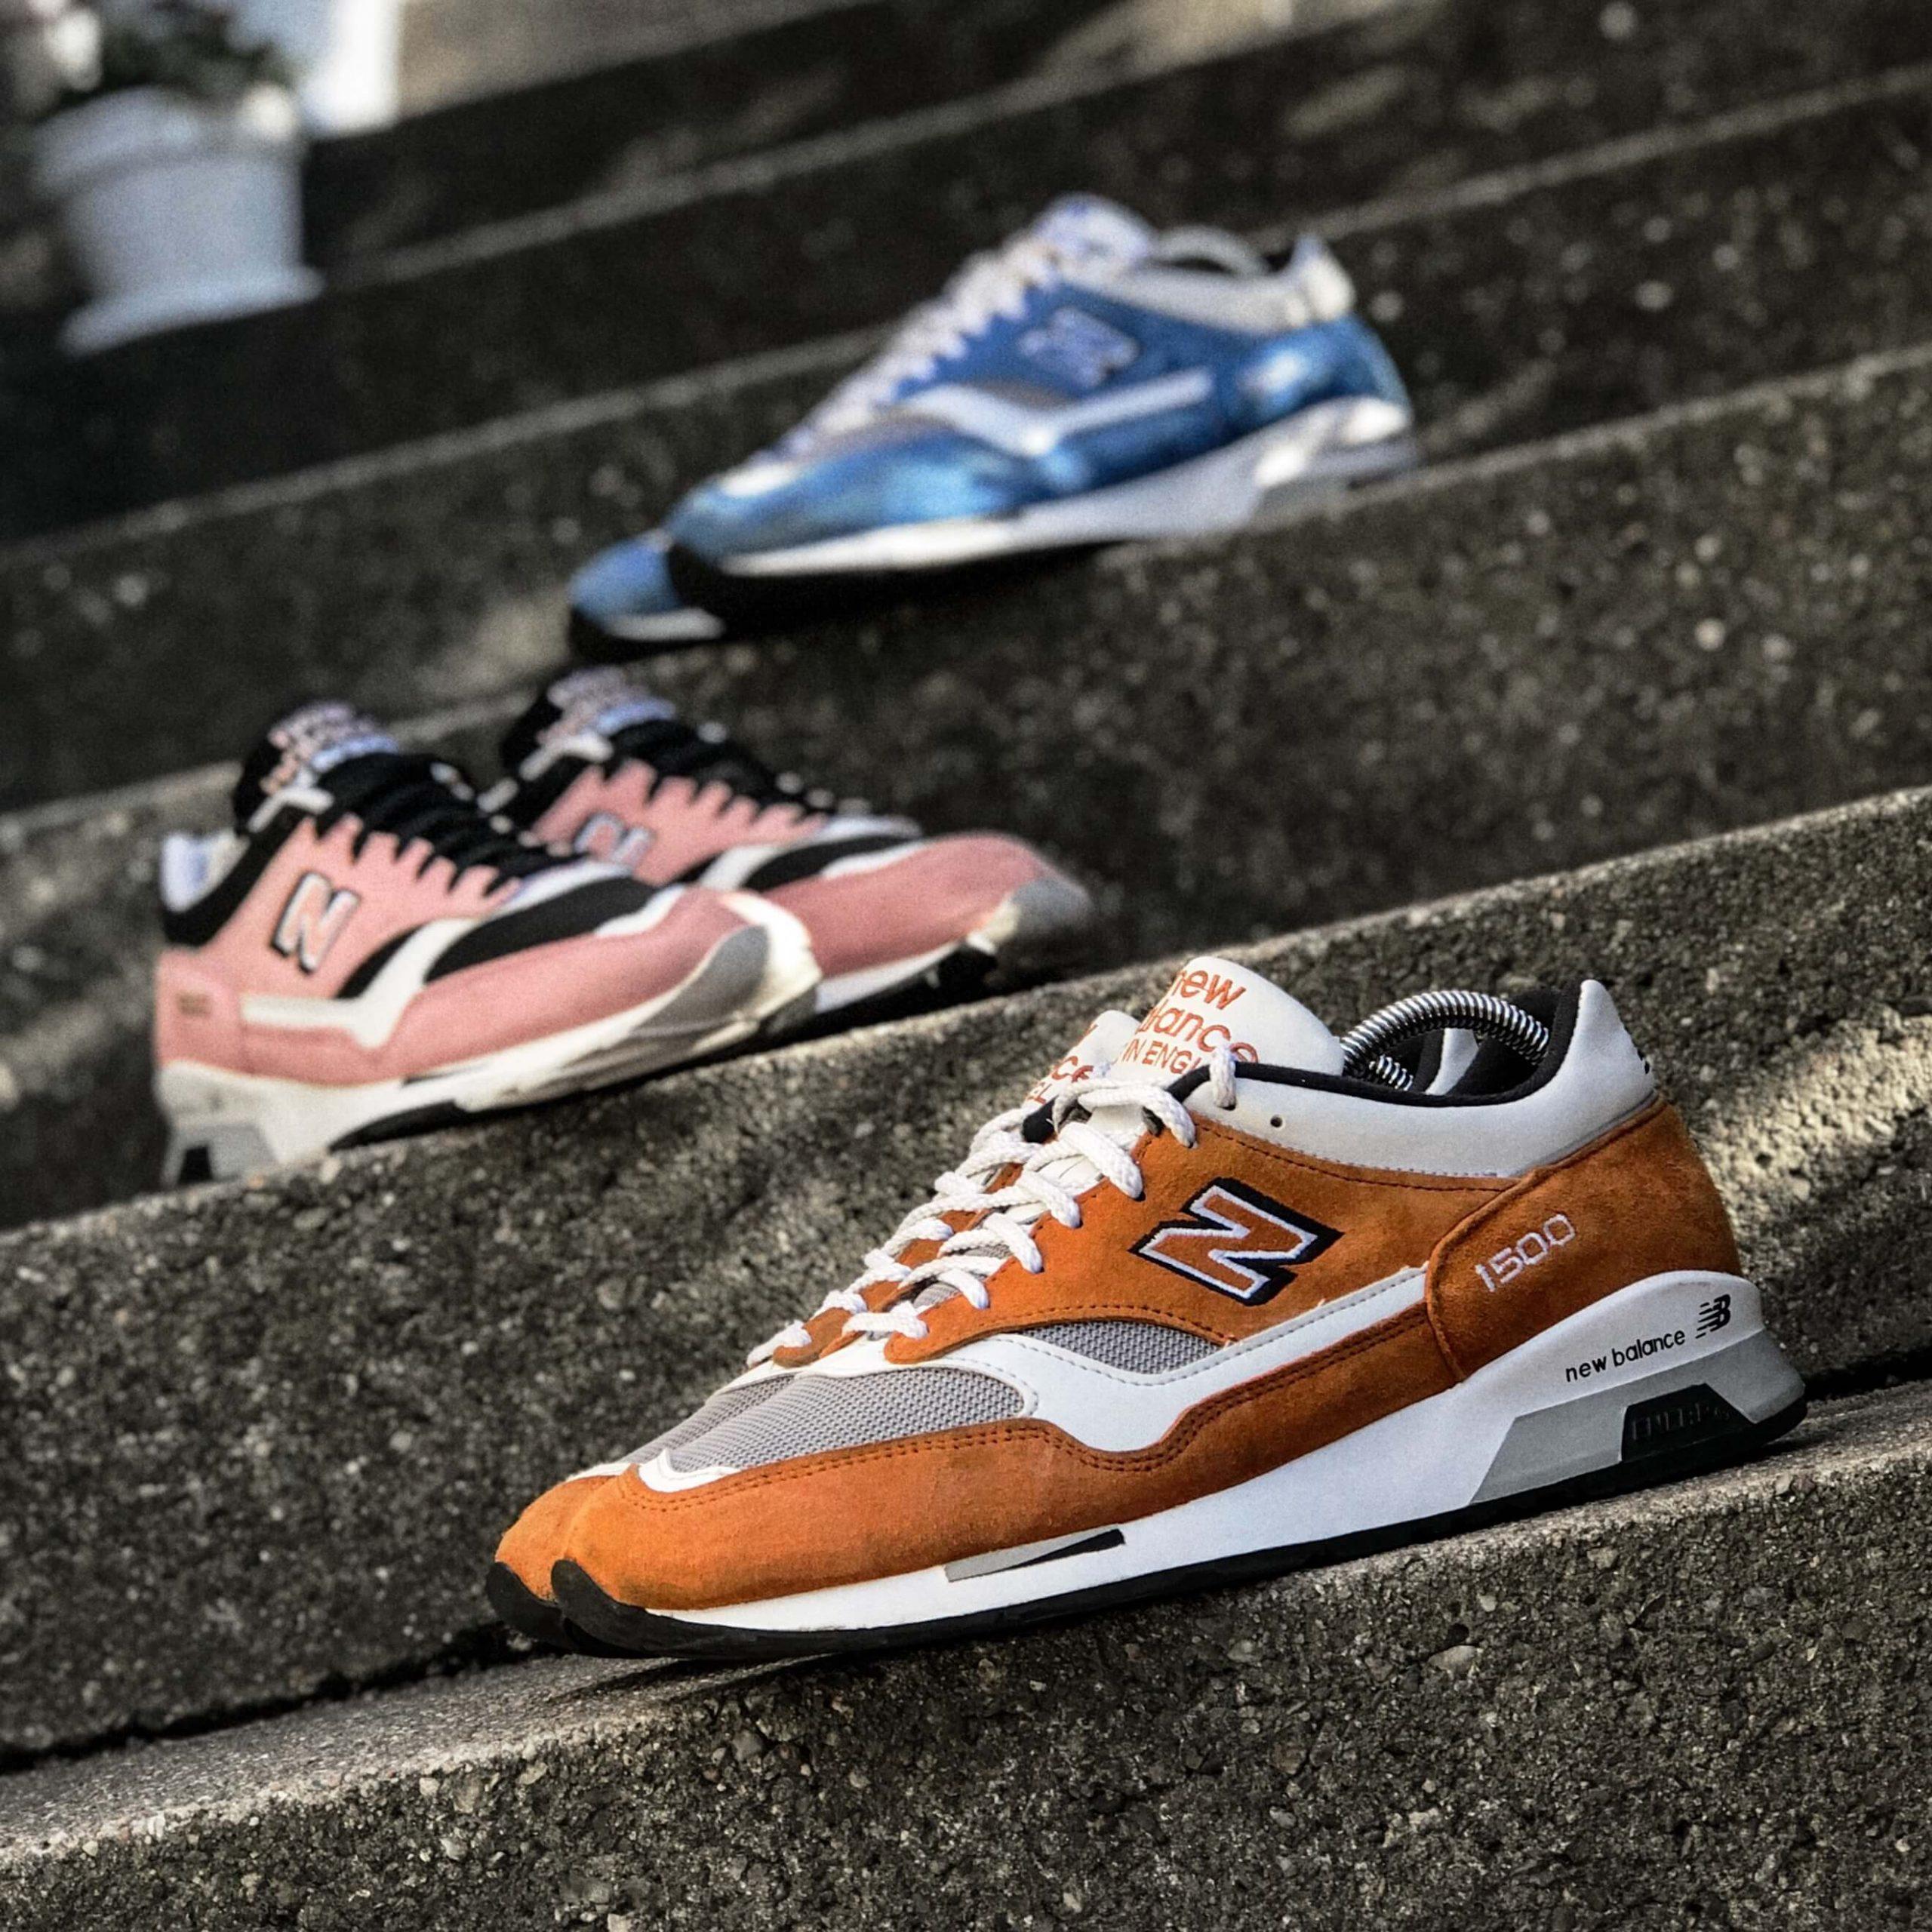 Sneakerplaats interview with sneakerfreak Simon Steenberg